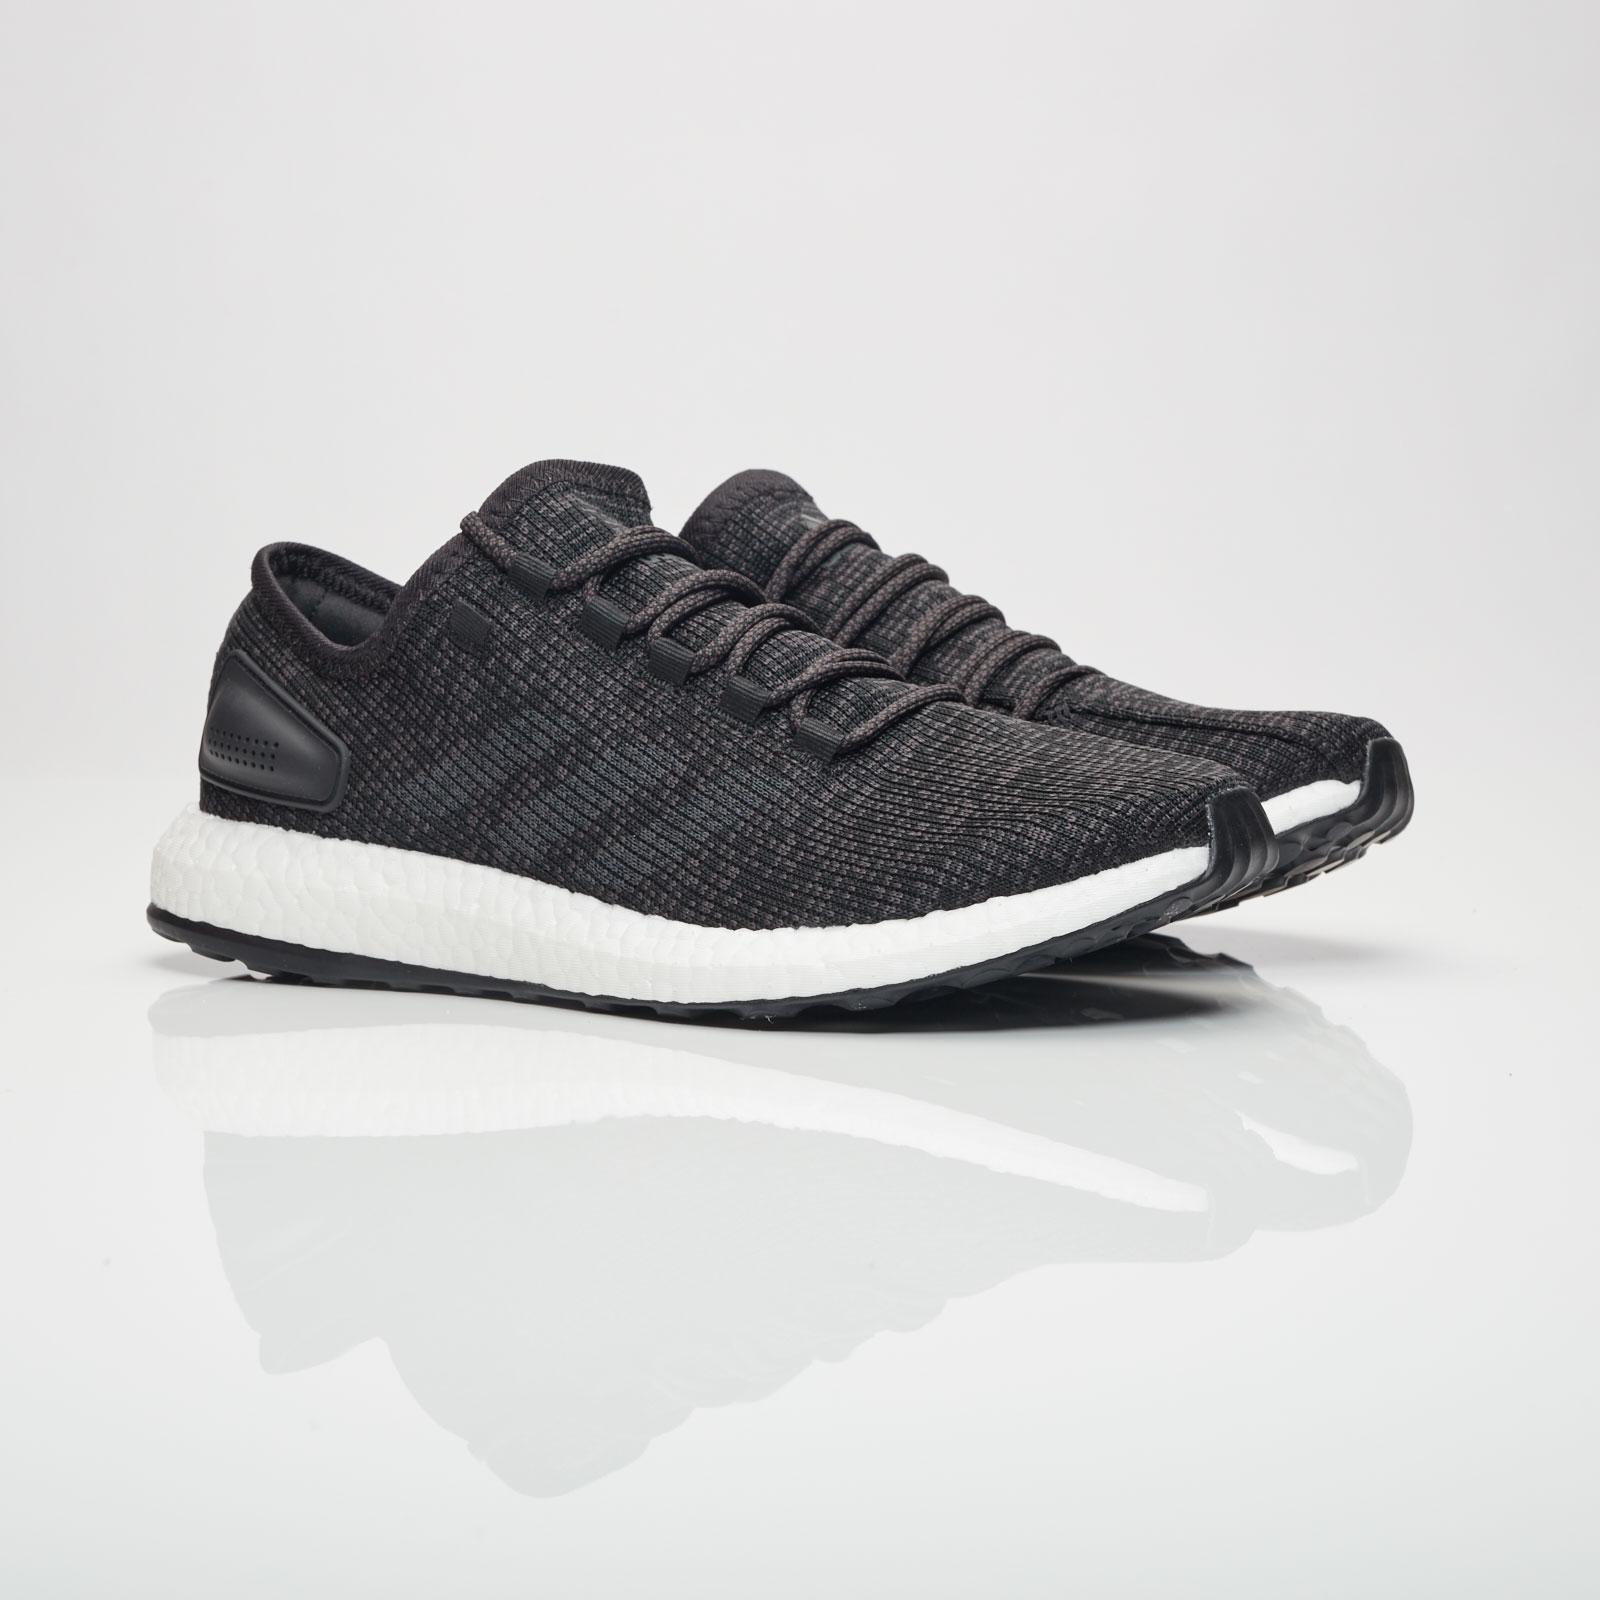 e3fd835563b9b adidas PureBOOST - Ba8899 - Sneakersnstuff